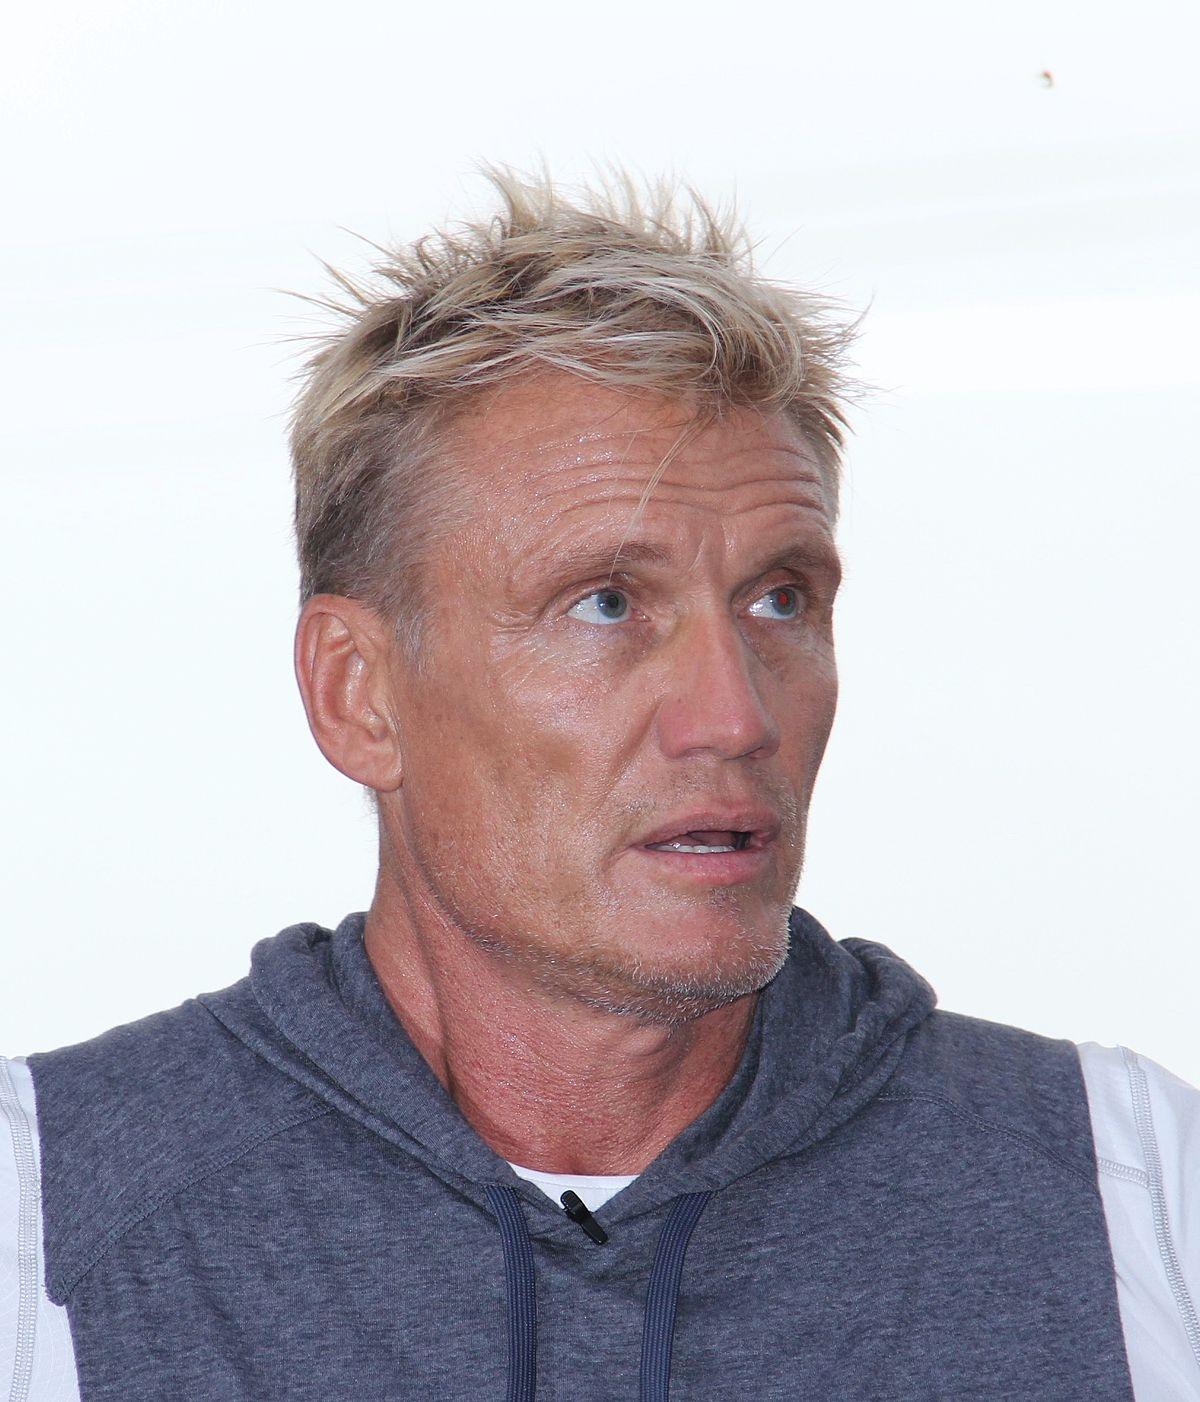 Dolph Lundgren - Wikipedia